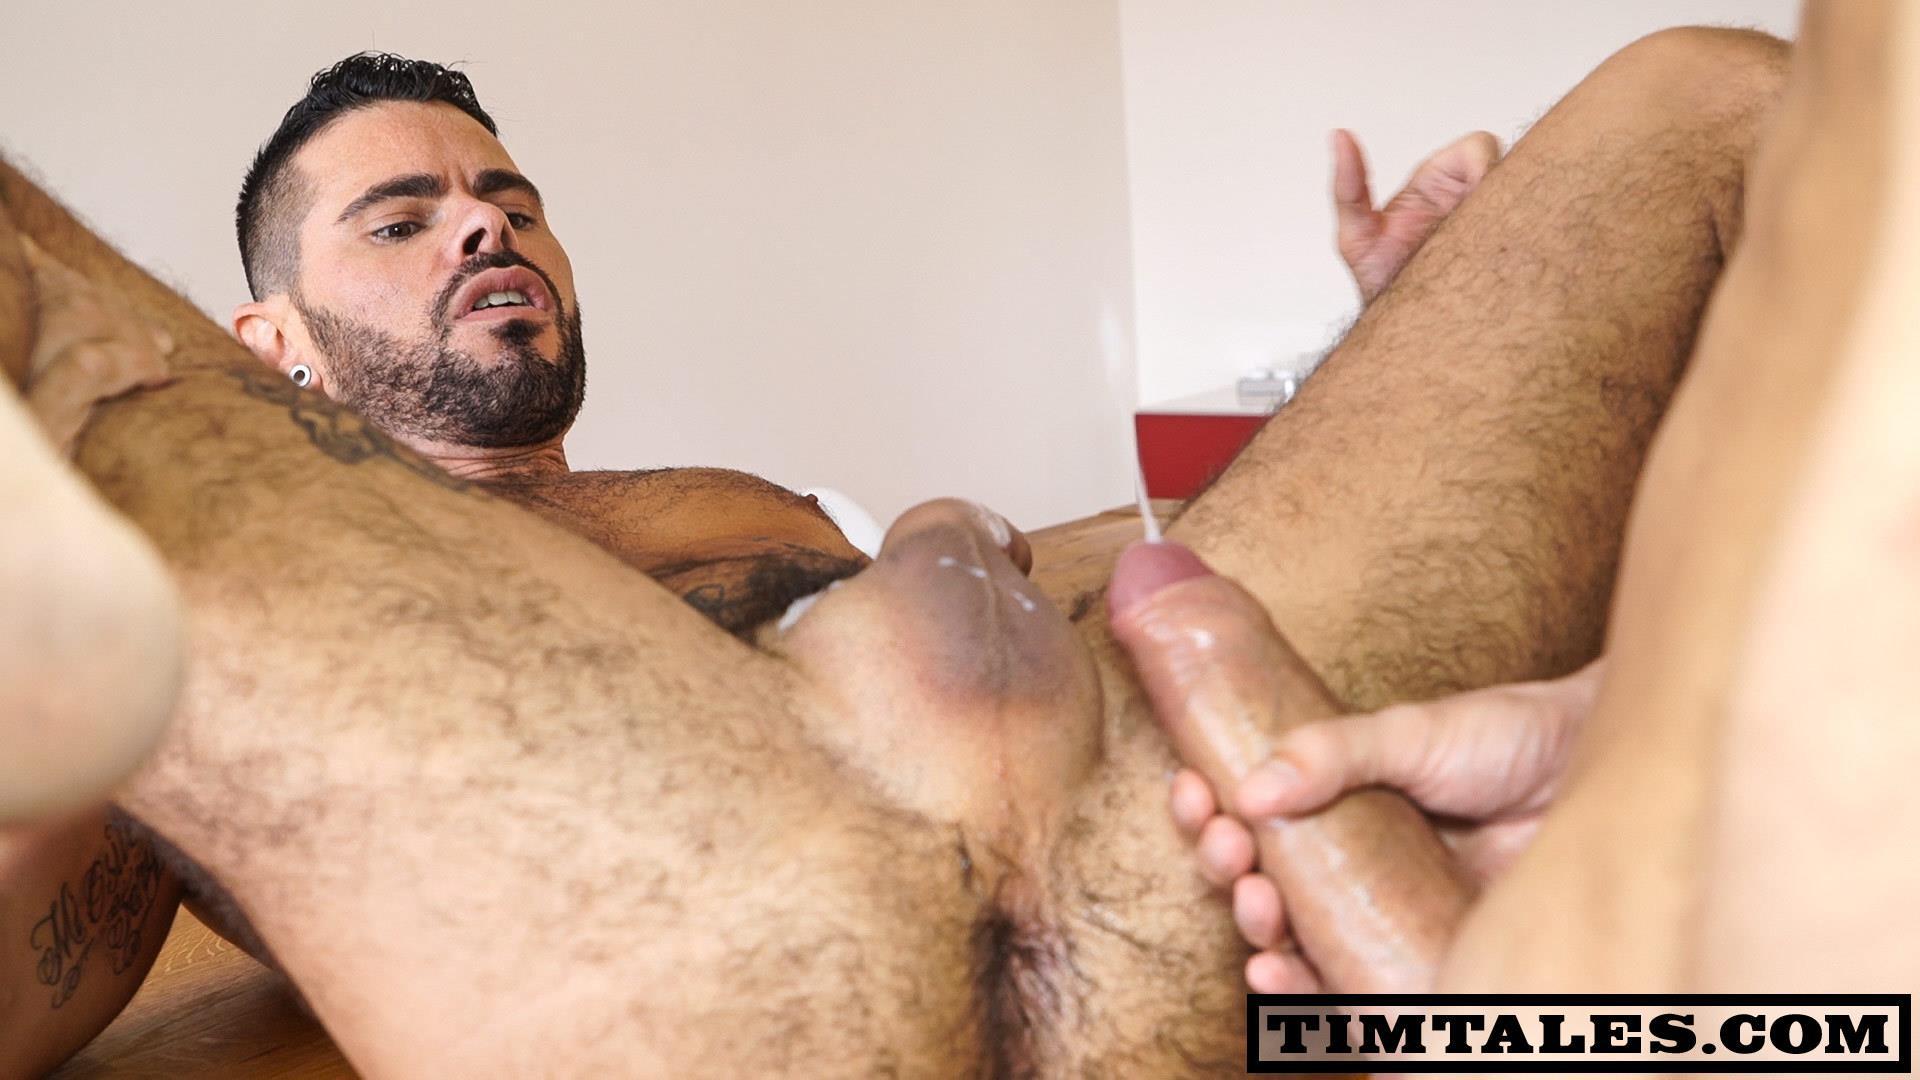 TimTales-Esteban-and-Mario-Domenech-Big-Uncut-Cock-Bareback-Amateur-Gay-Porn-06 TimTales: Esteban Fucking Mario Domenech